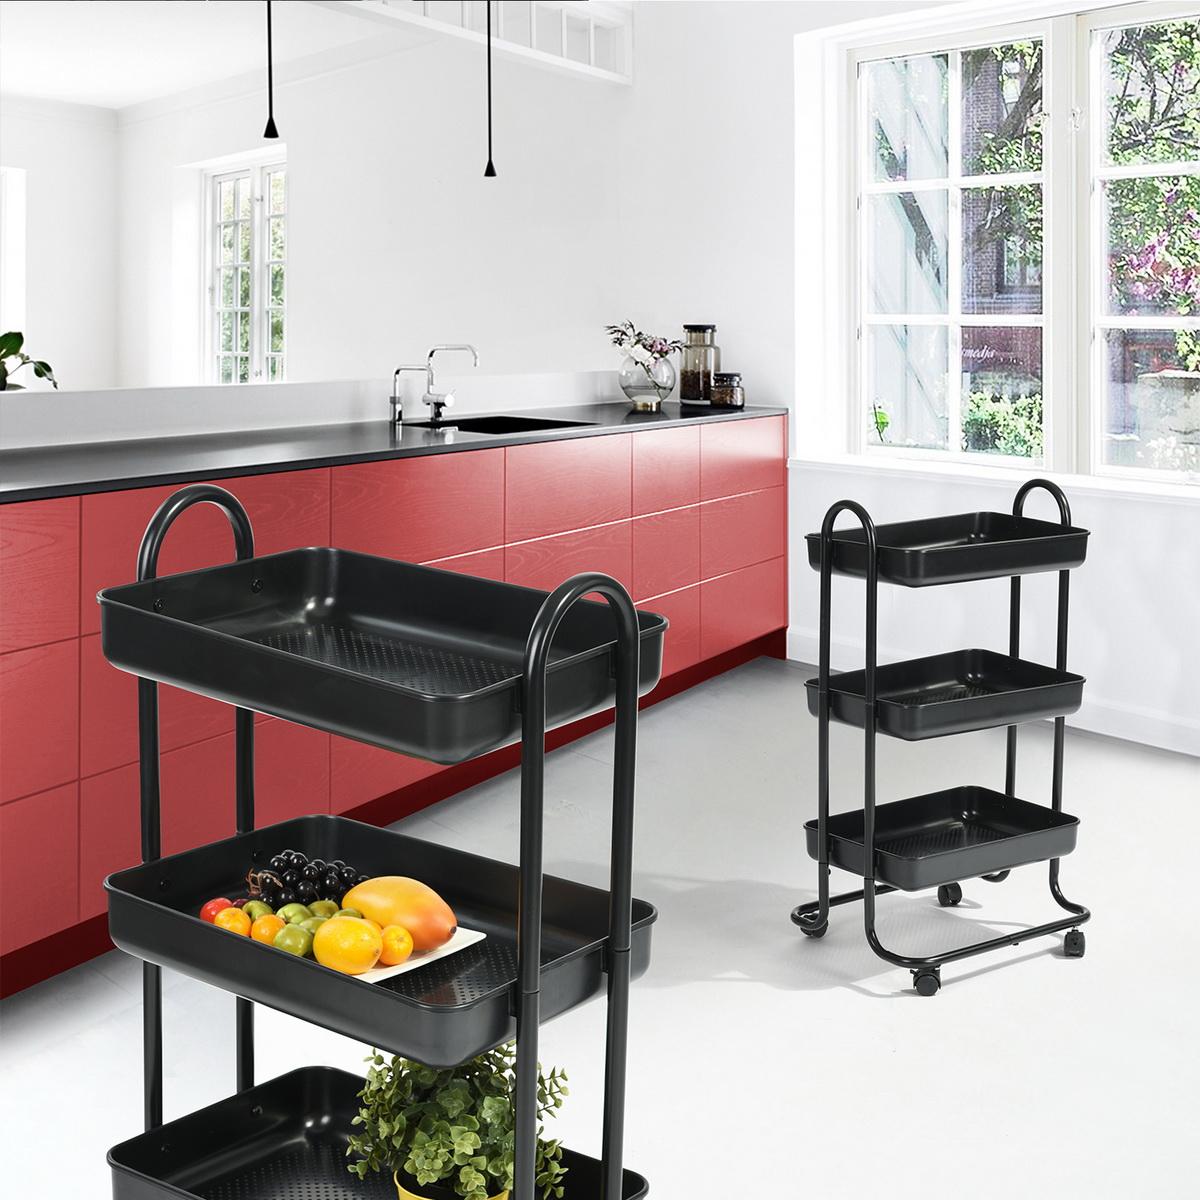 3-Tier Black Kitchen Trolley Rolling Tray Wheels Dining ...